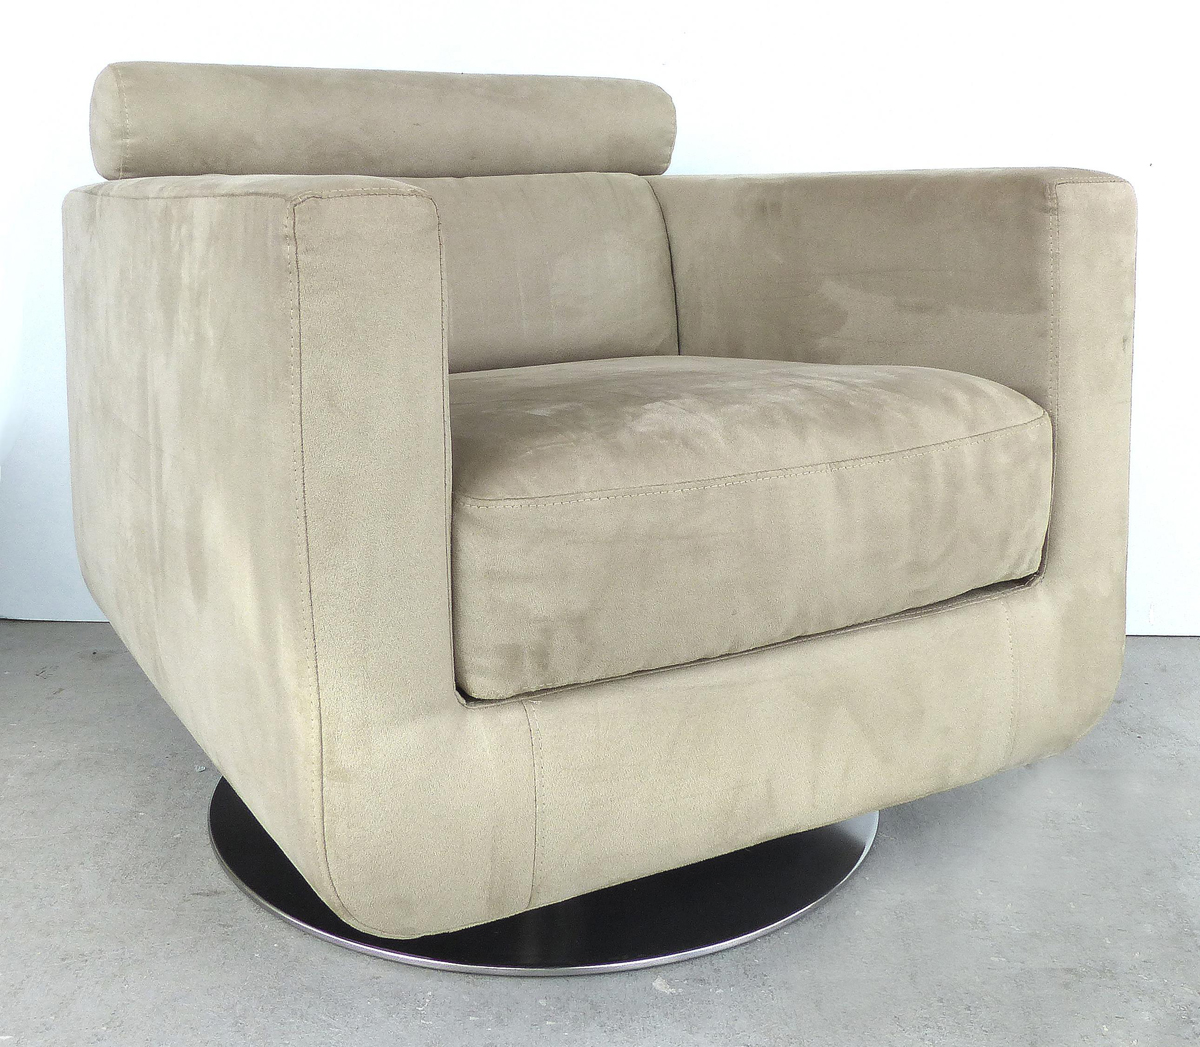 Italian UltraSuede Swivel Club Chairs by Natuzzi Salotti